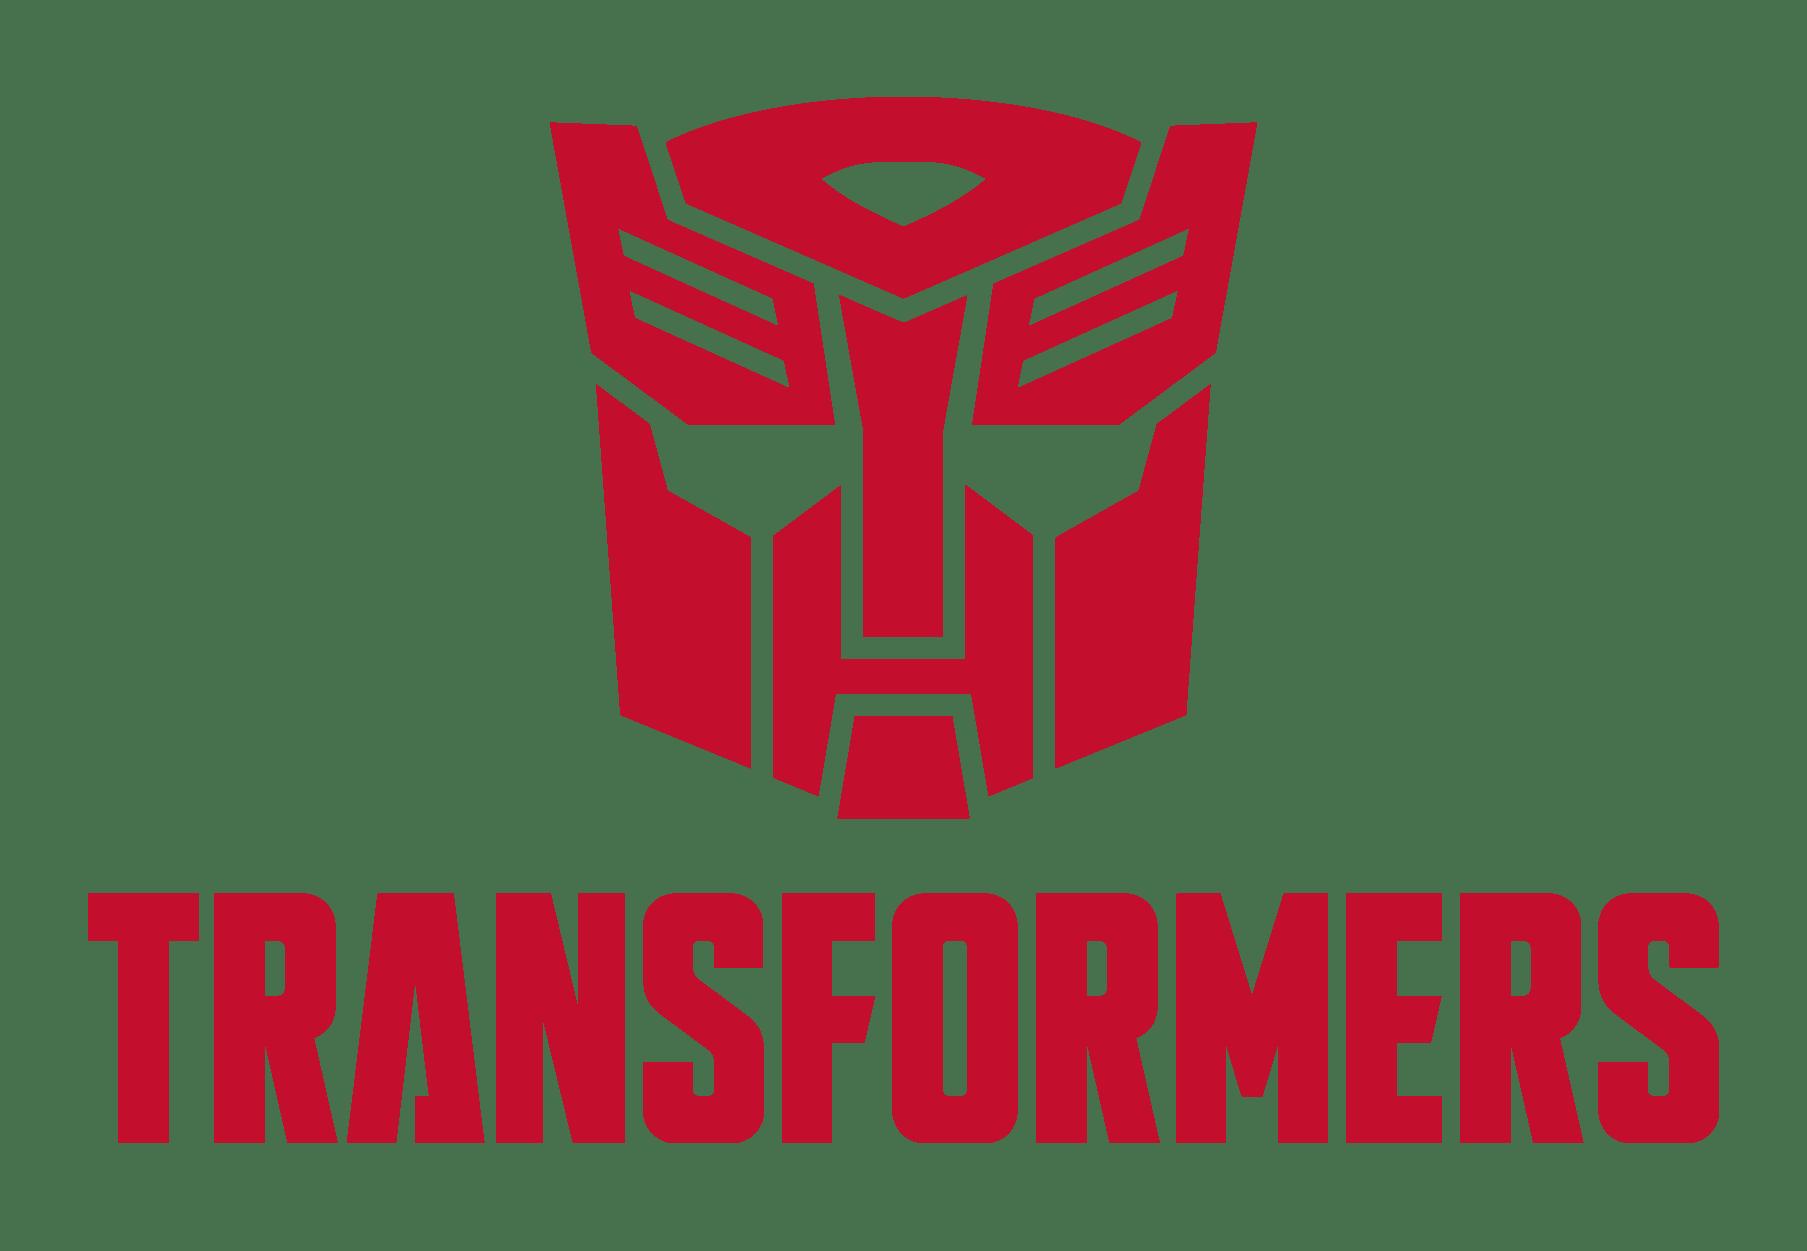 Transformers logo-c